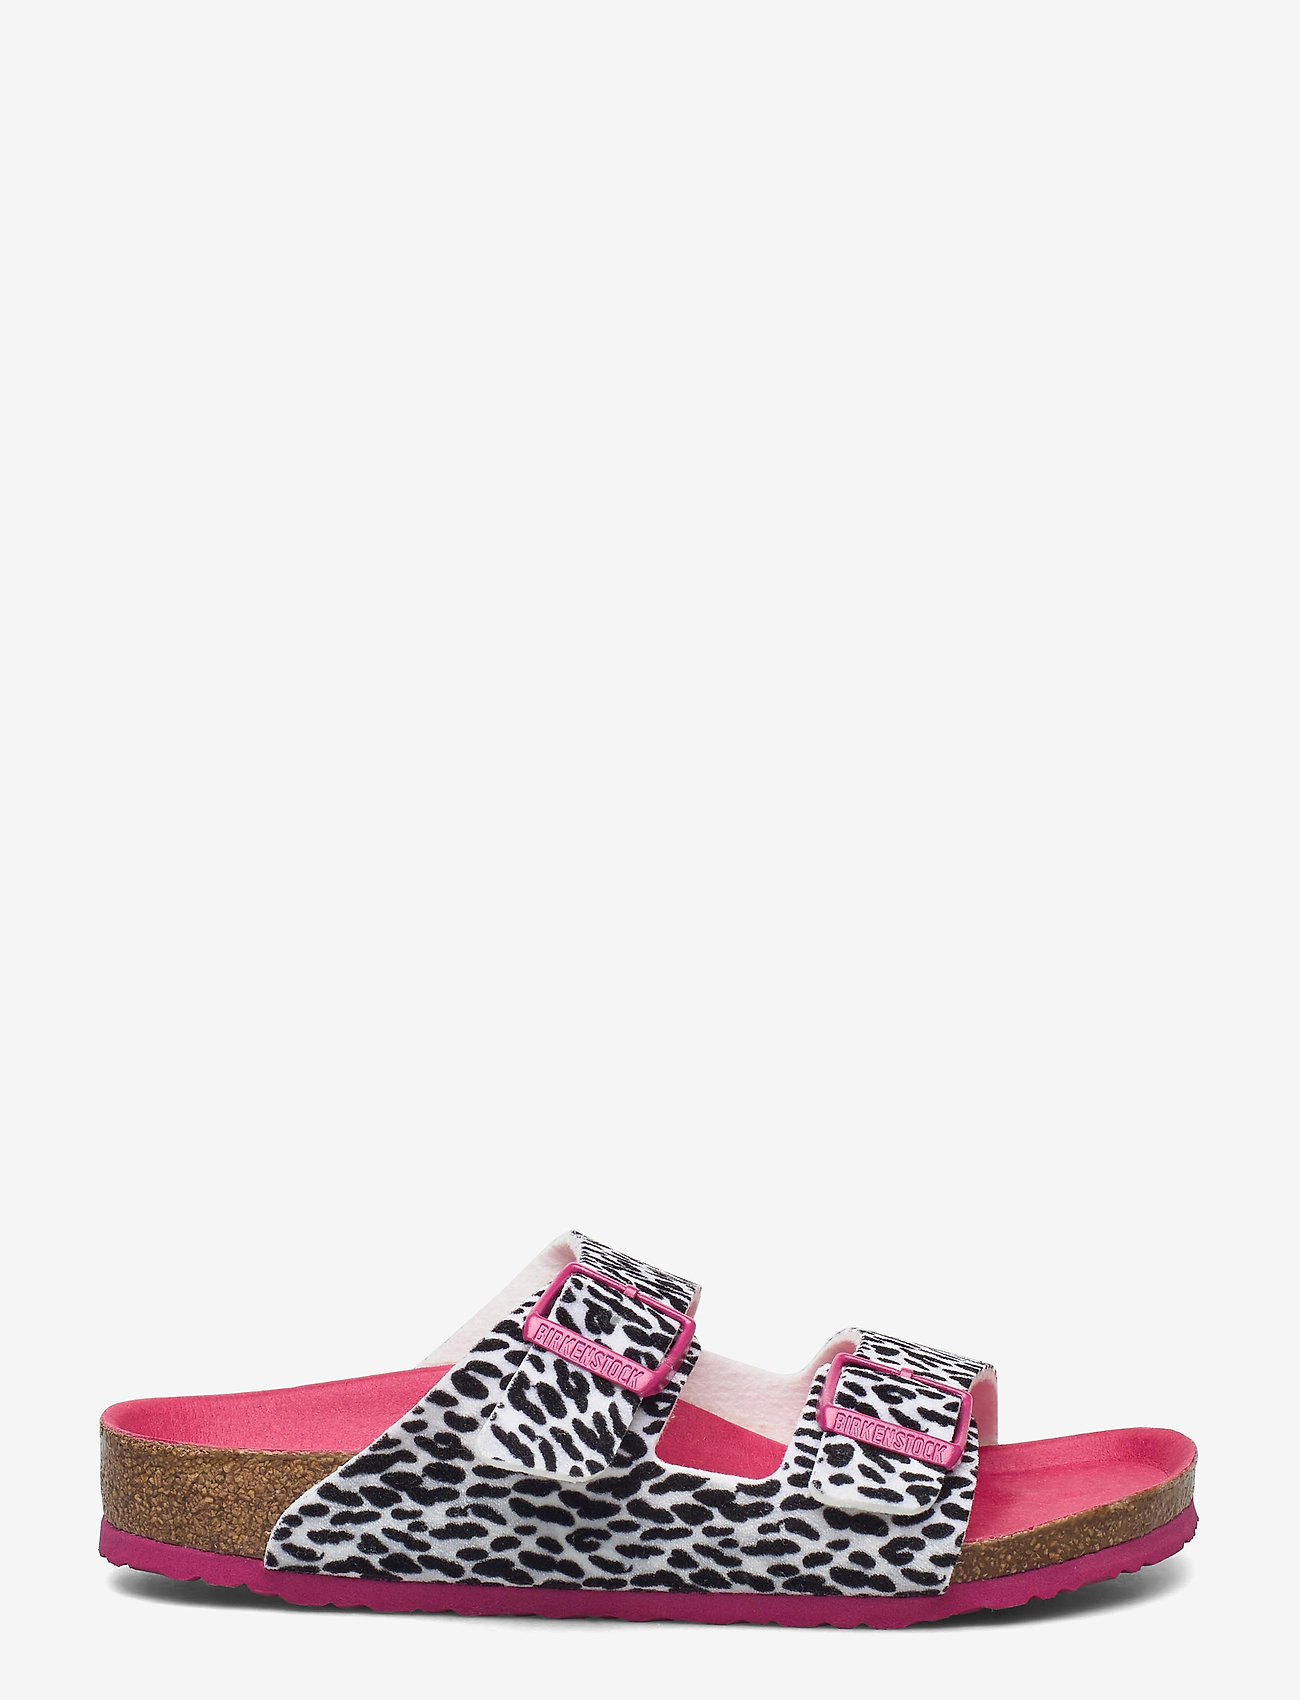 Birkenstock - Arizona - hjemmesko - leo lilly black pink - 1